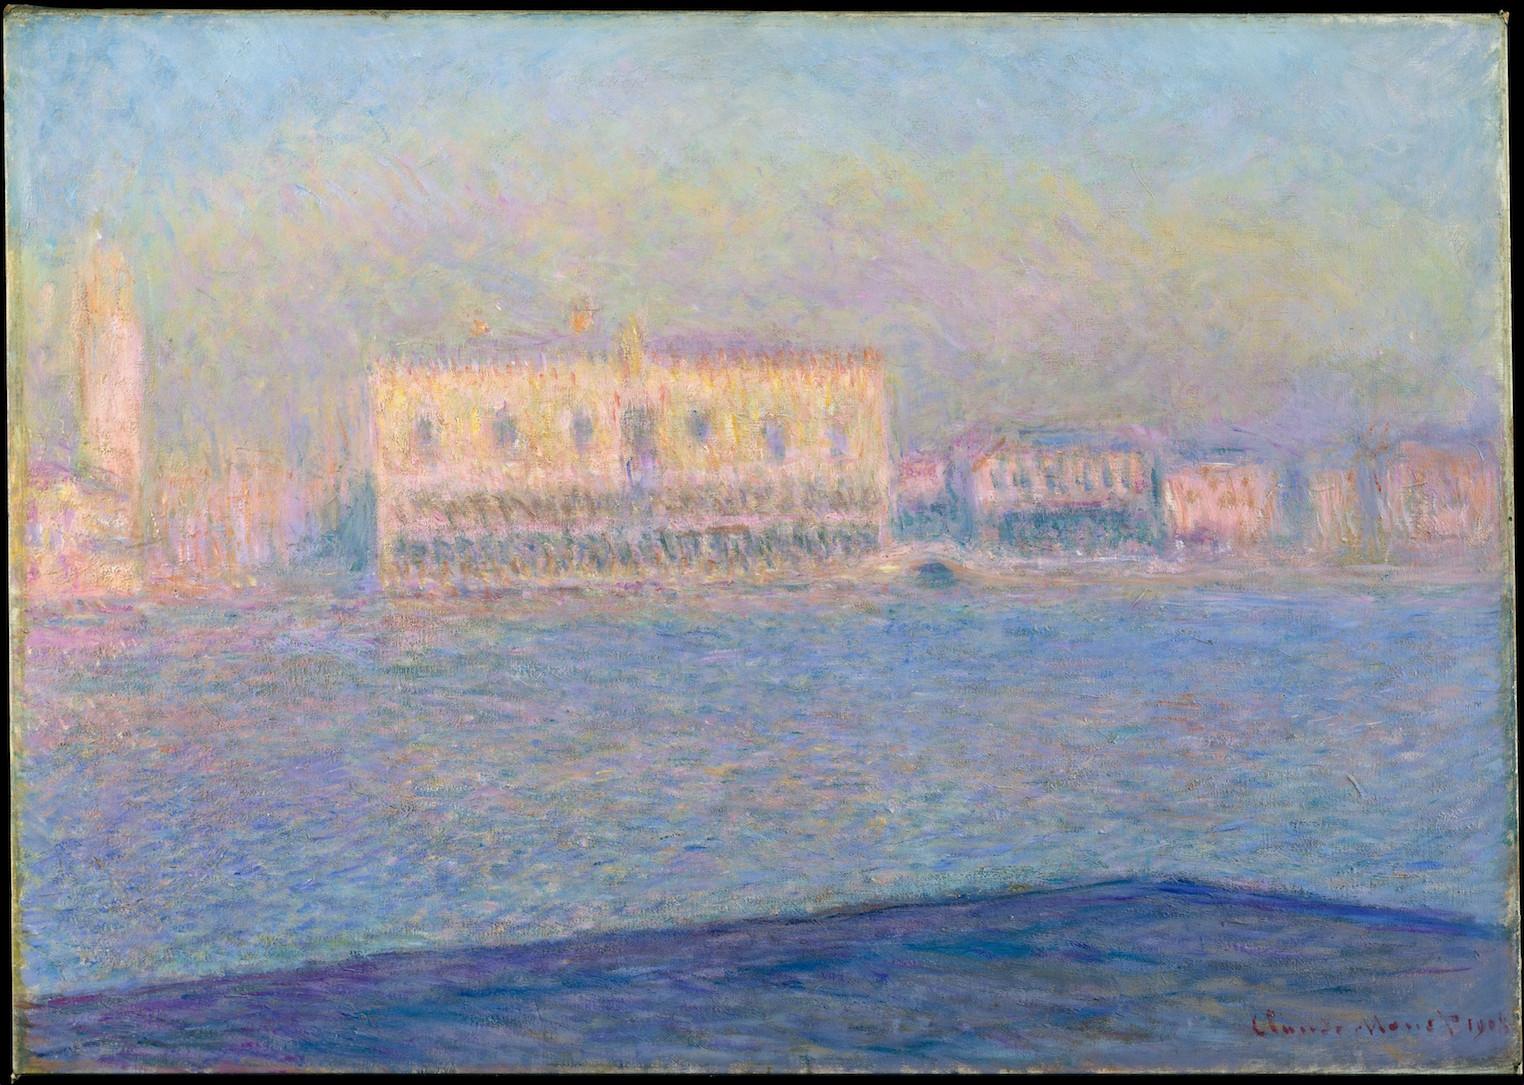 Le palais des Doges Vu de San Giorgio Maggiore, Claude Monnet